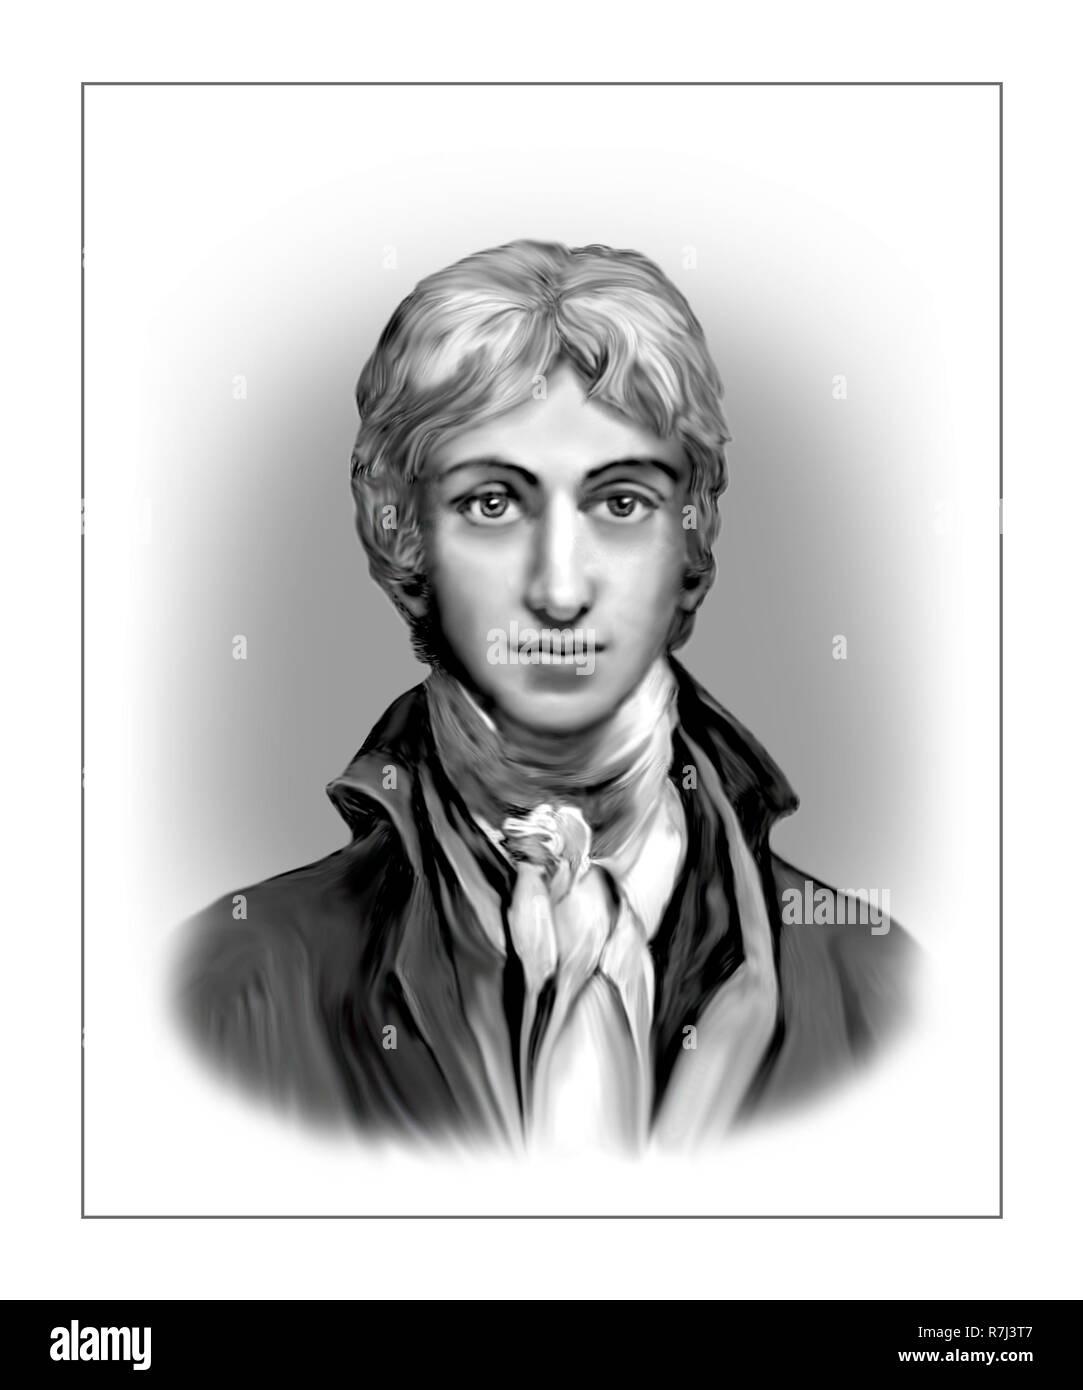 Joseph Mallord William Turner 1775 - 1851 English Painter - Stock Image